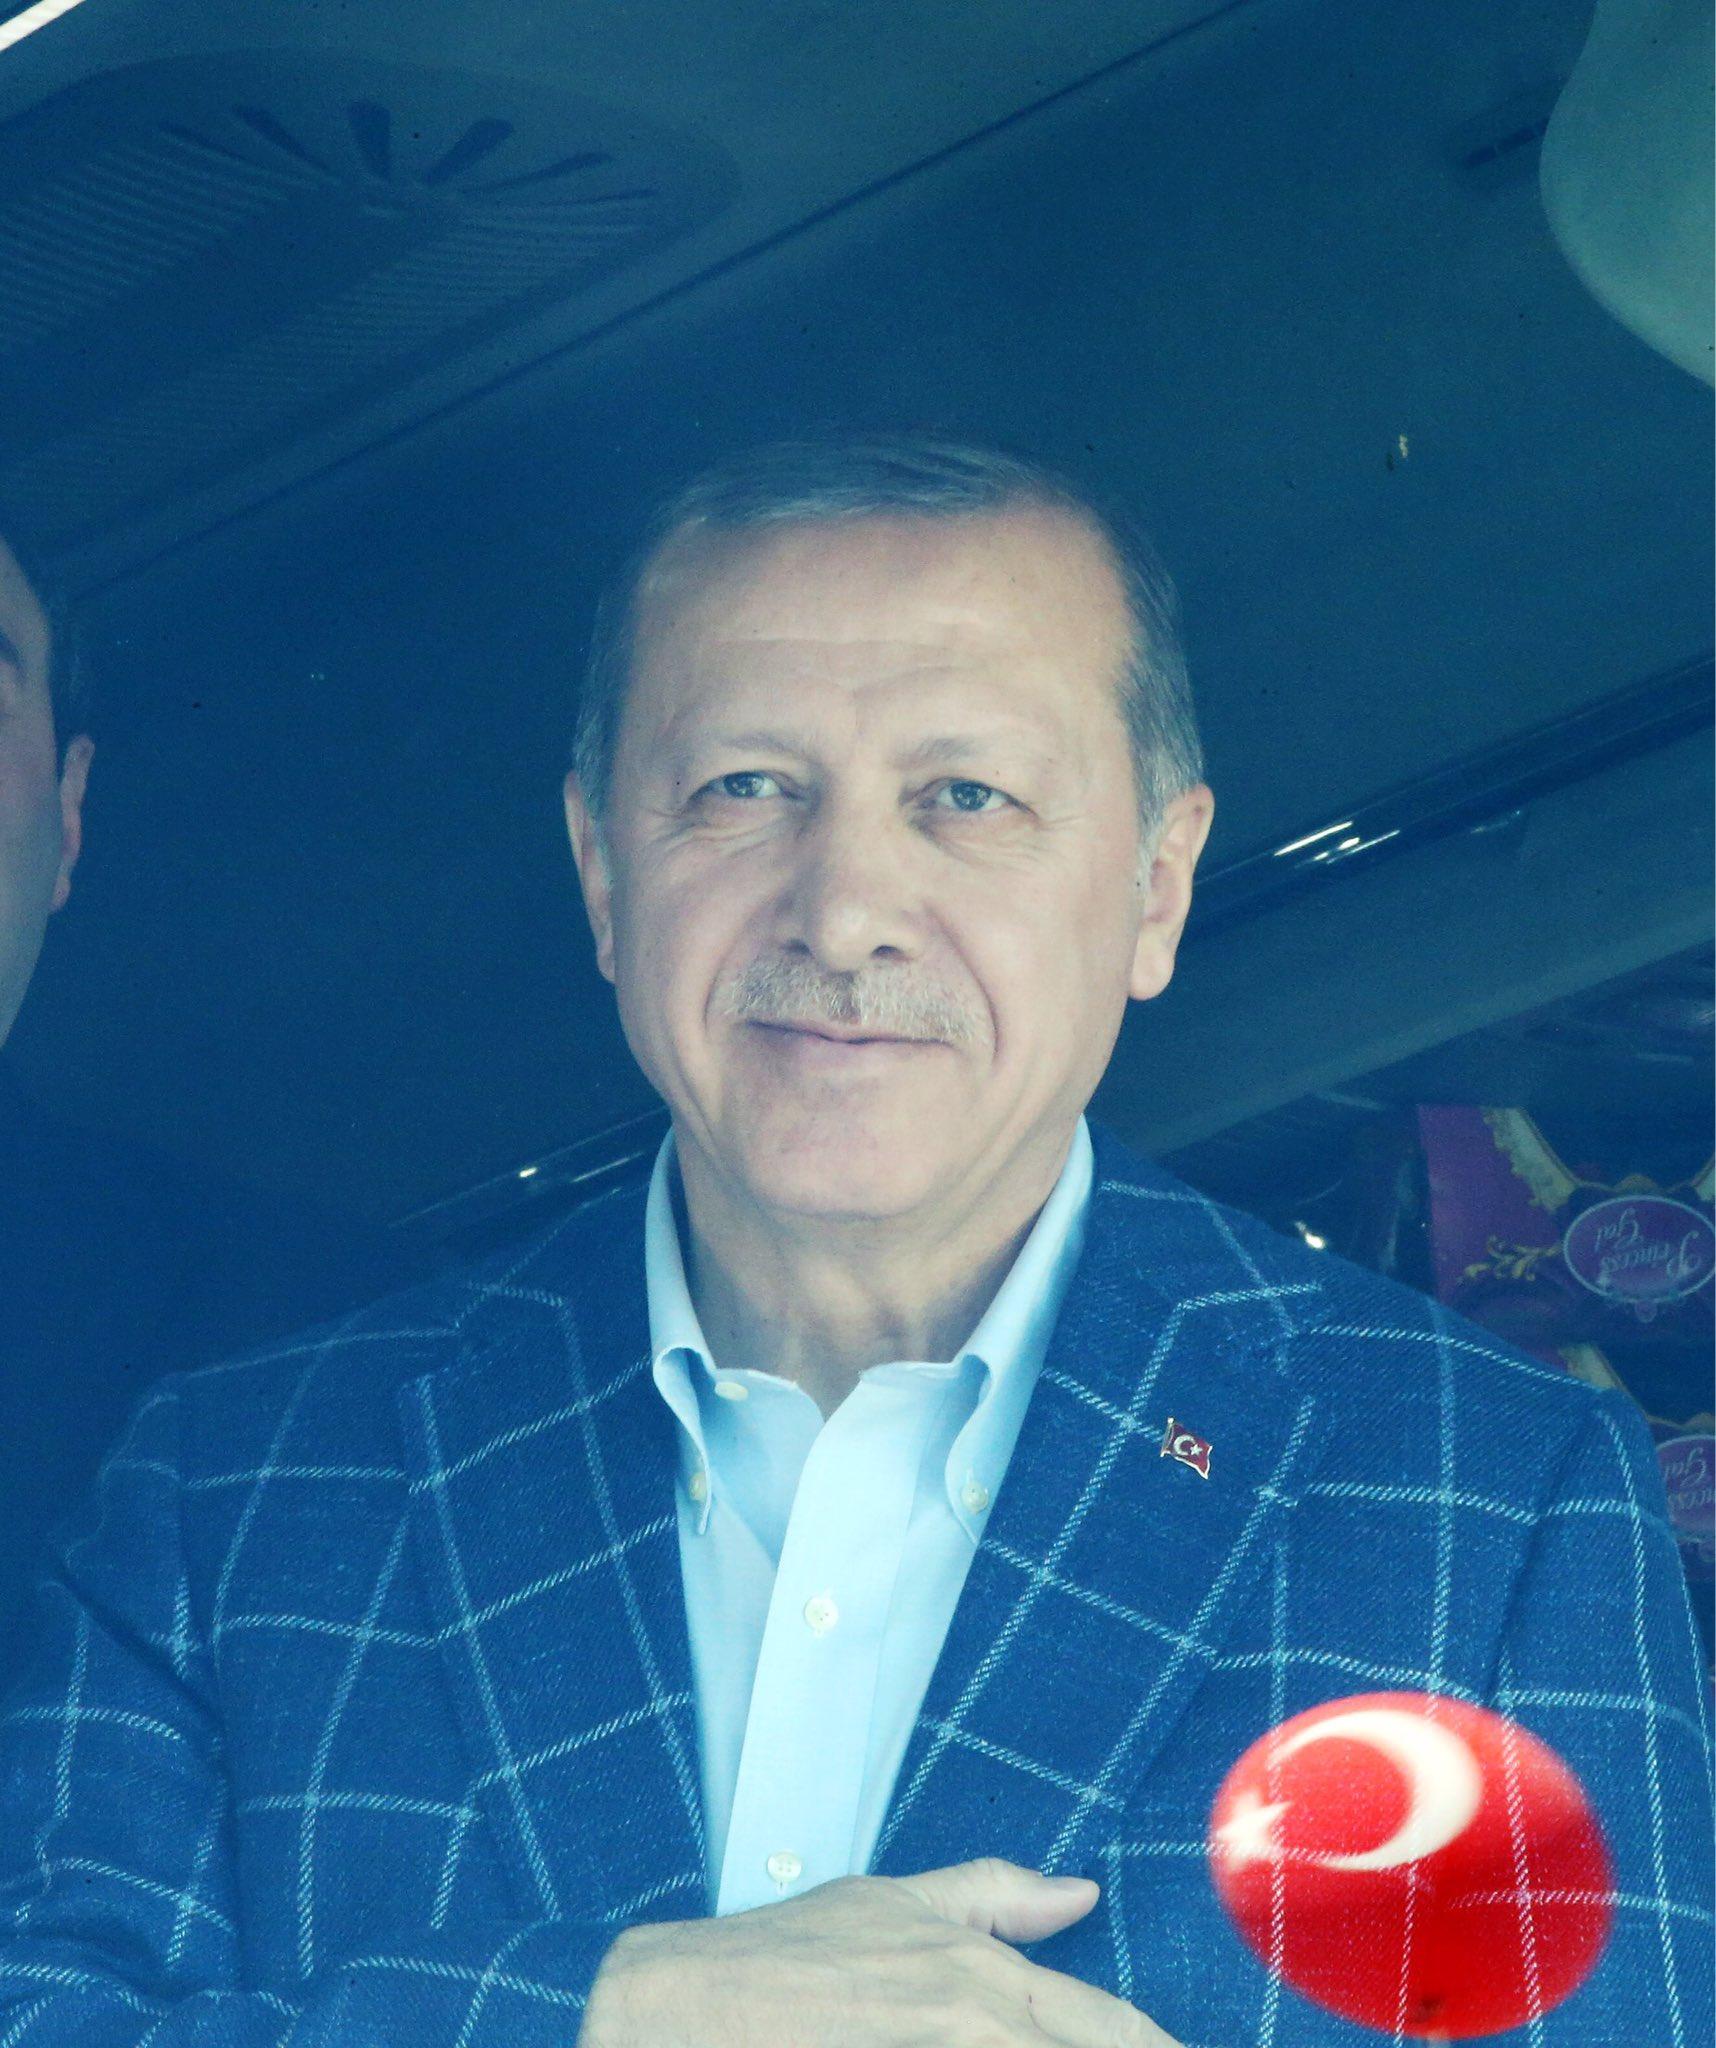 Teşekkürler Antalya! https://t.co/KrwRwrgmDB